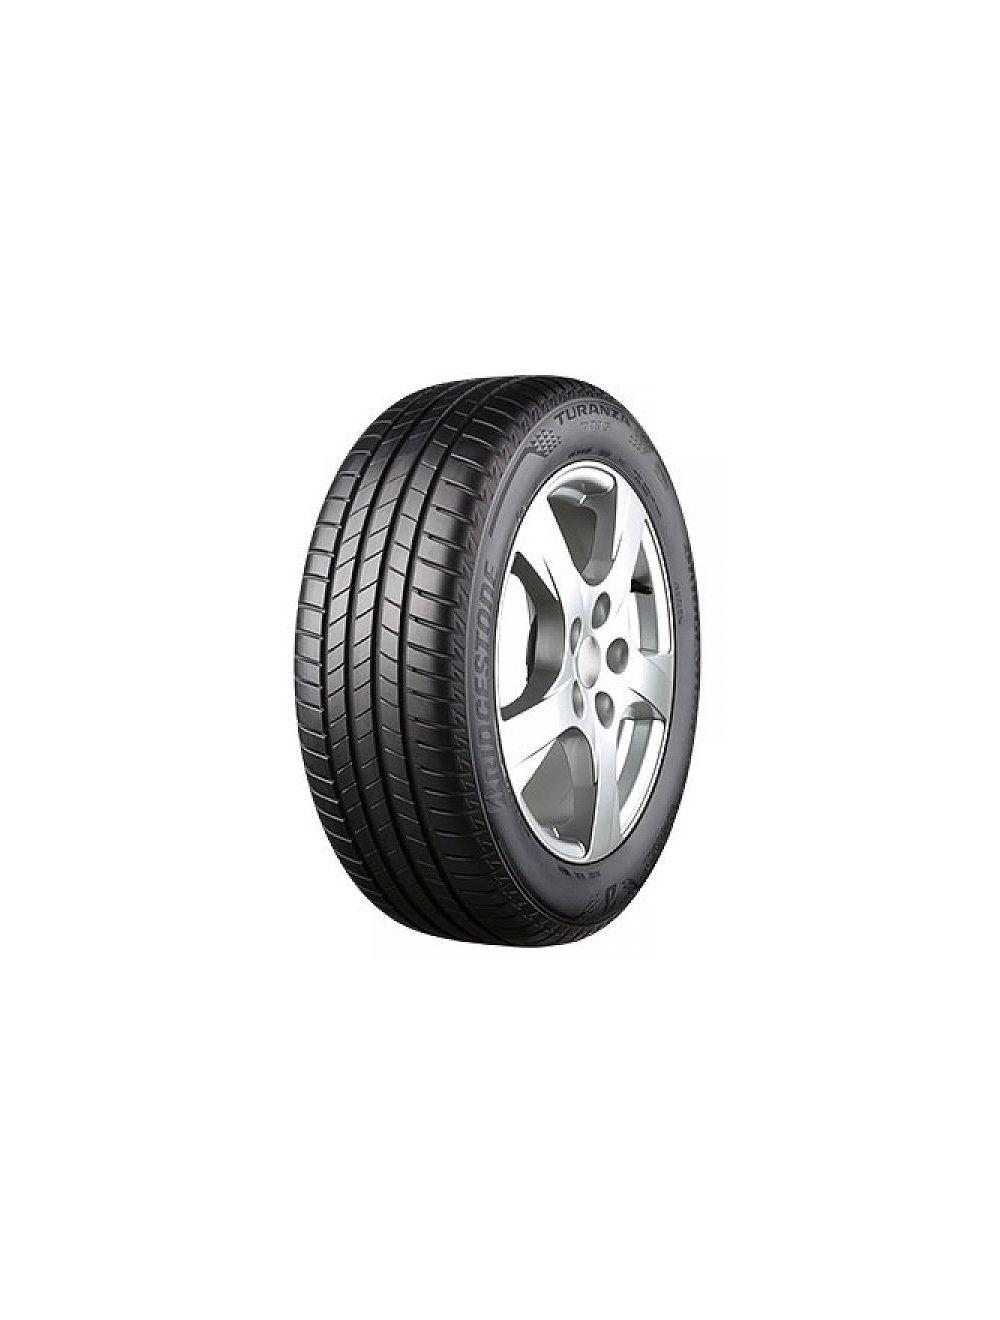 Bridgestone 245/45R18 Y T005 XL * Nyári gumi